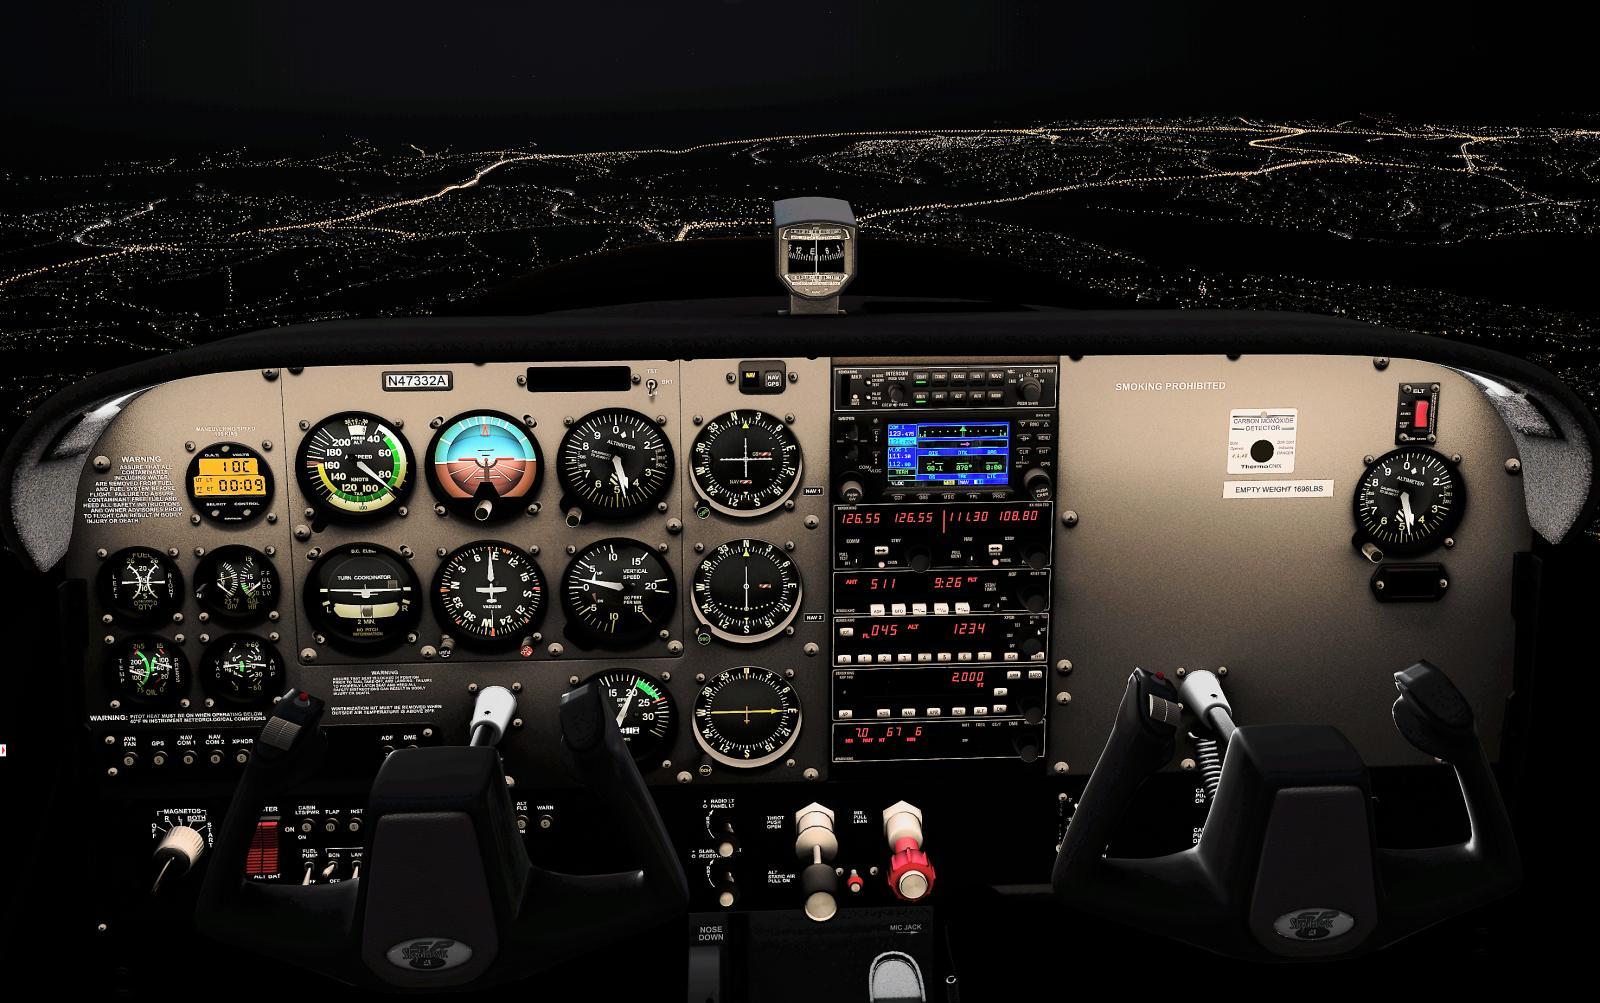 İsim:  Airfoillabs_C172SP_high_res_16.jpg Görüntüleme: 367 Büyüklük:  233.4 KB (Kilobyte)